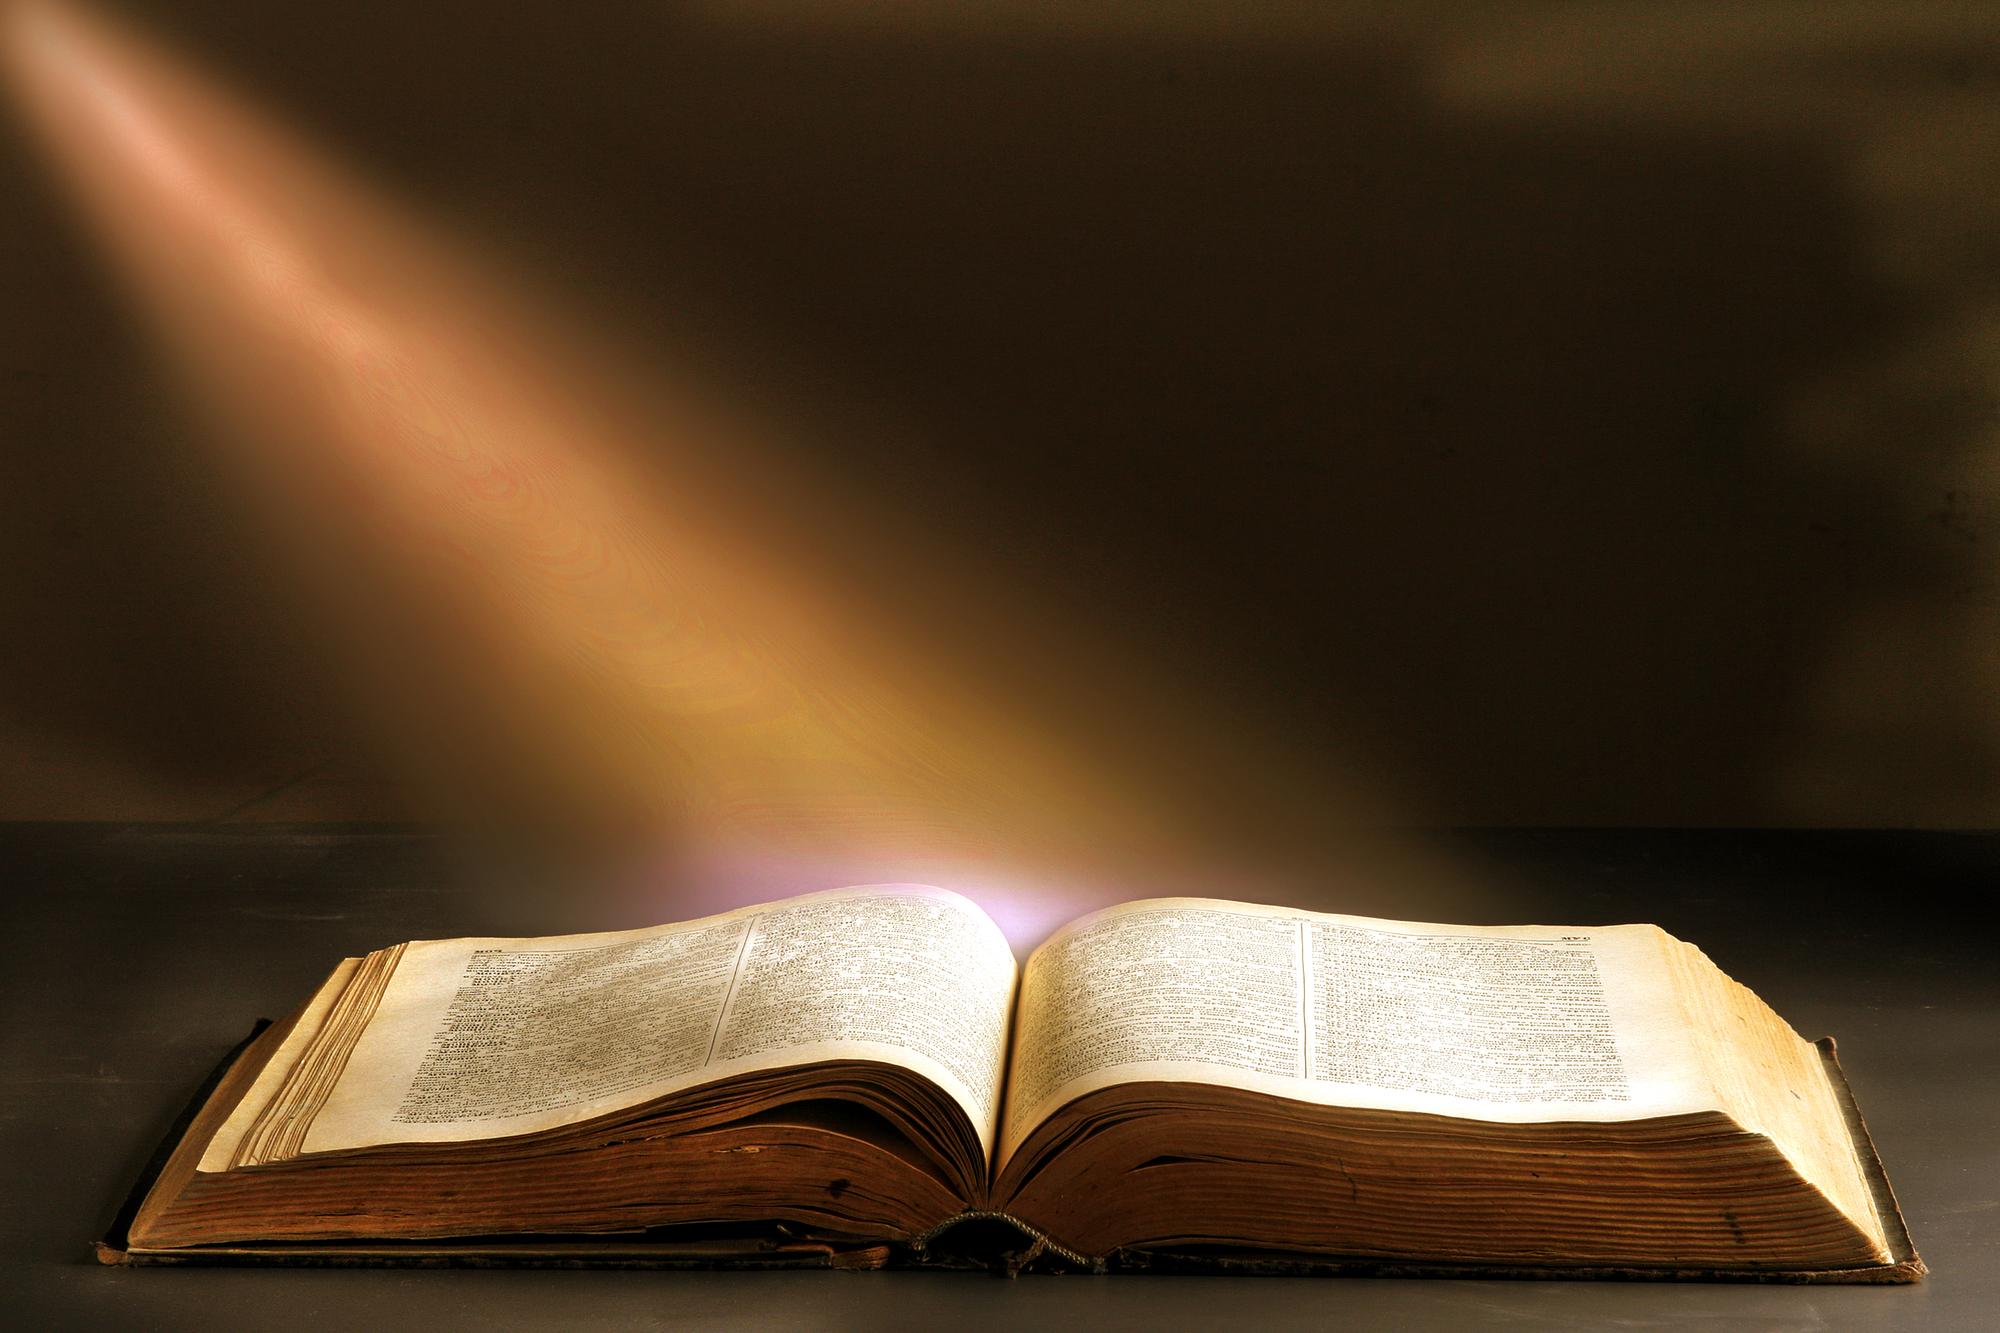 Wisdom Bible